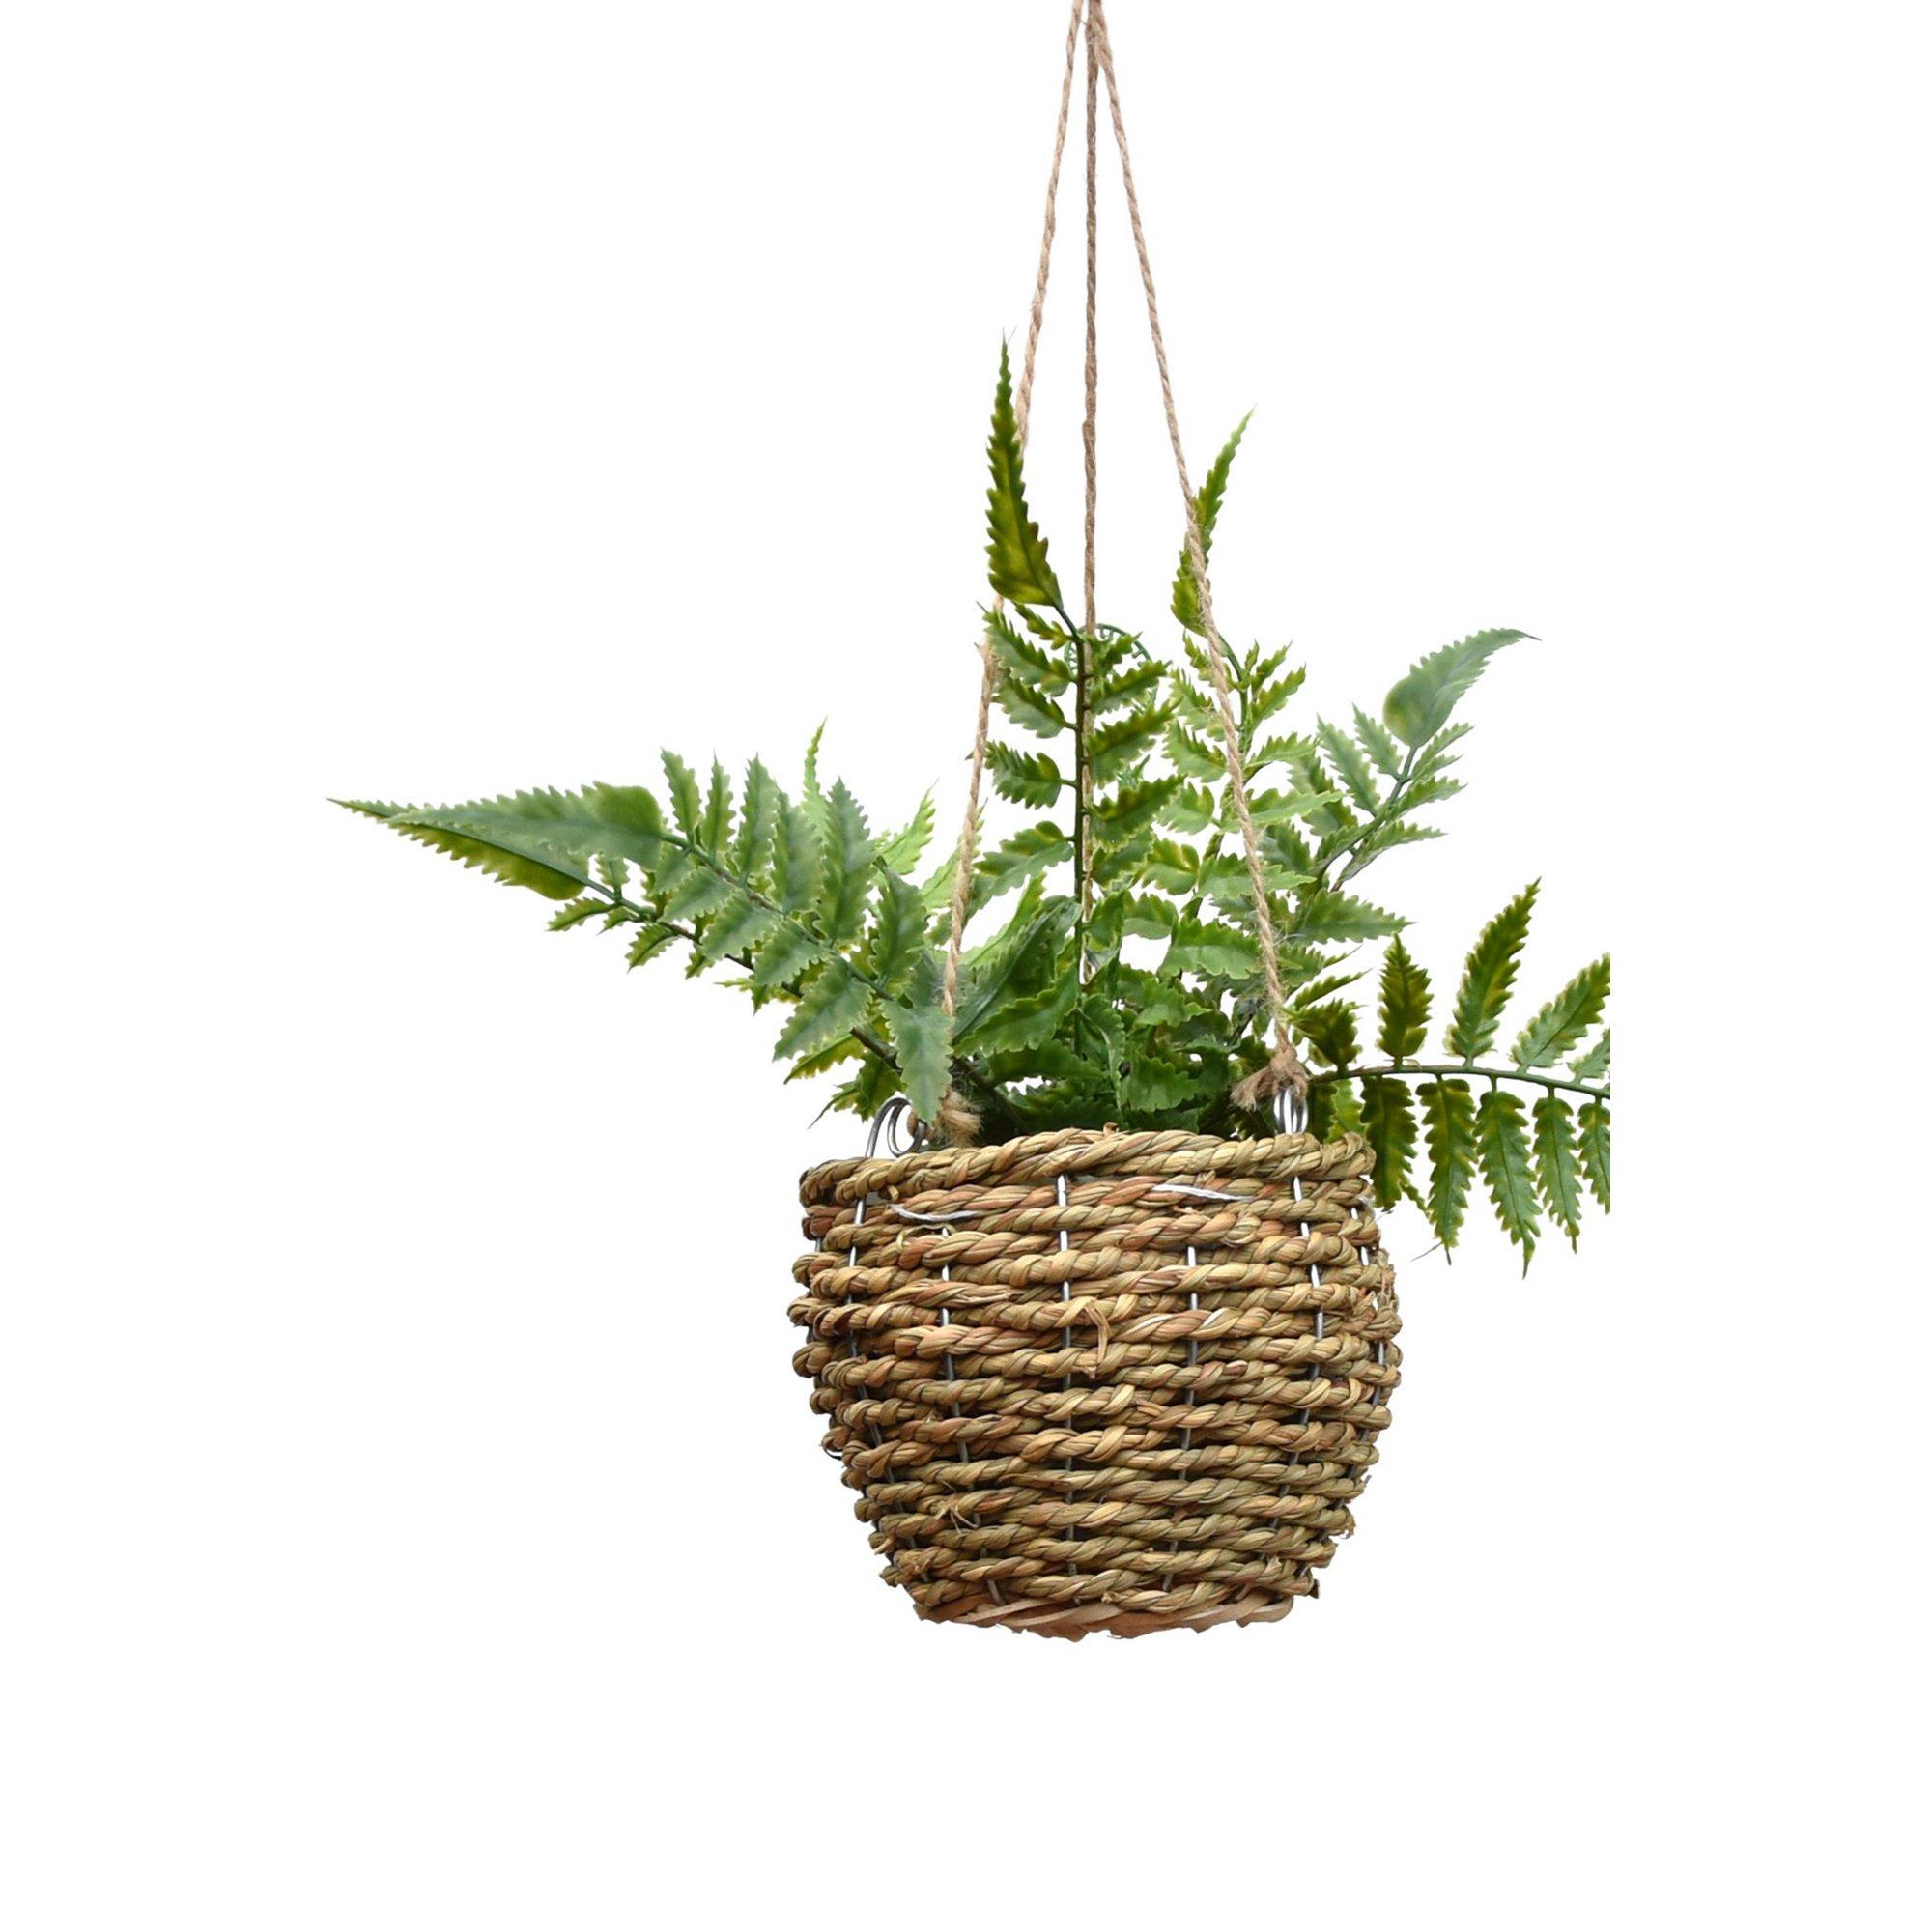 Image of Fern in Hanging Rattan Basket